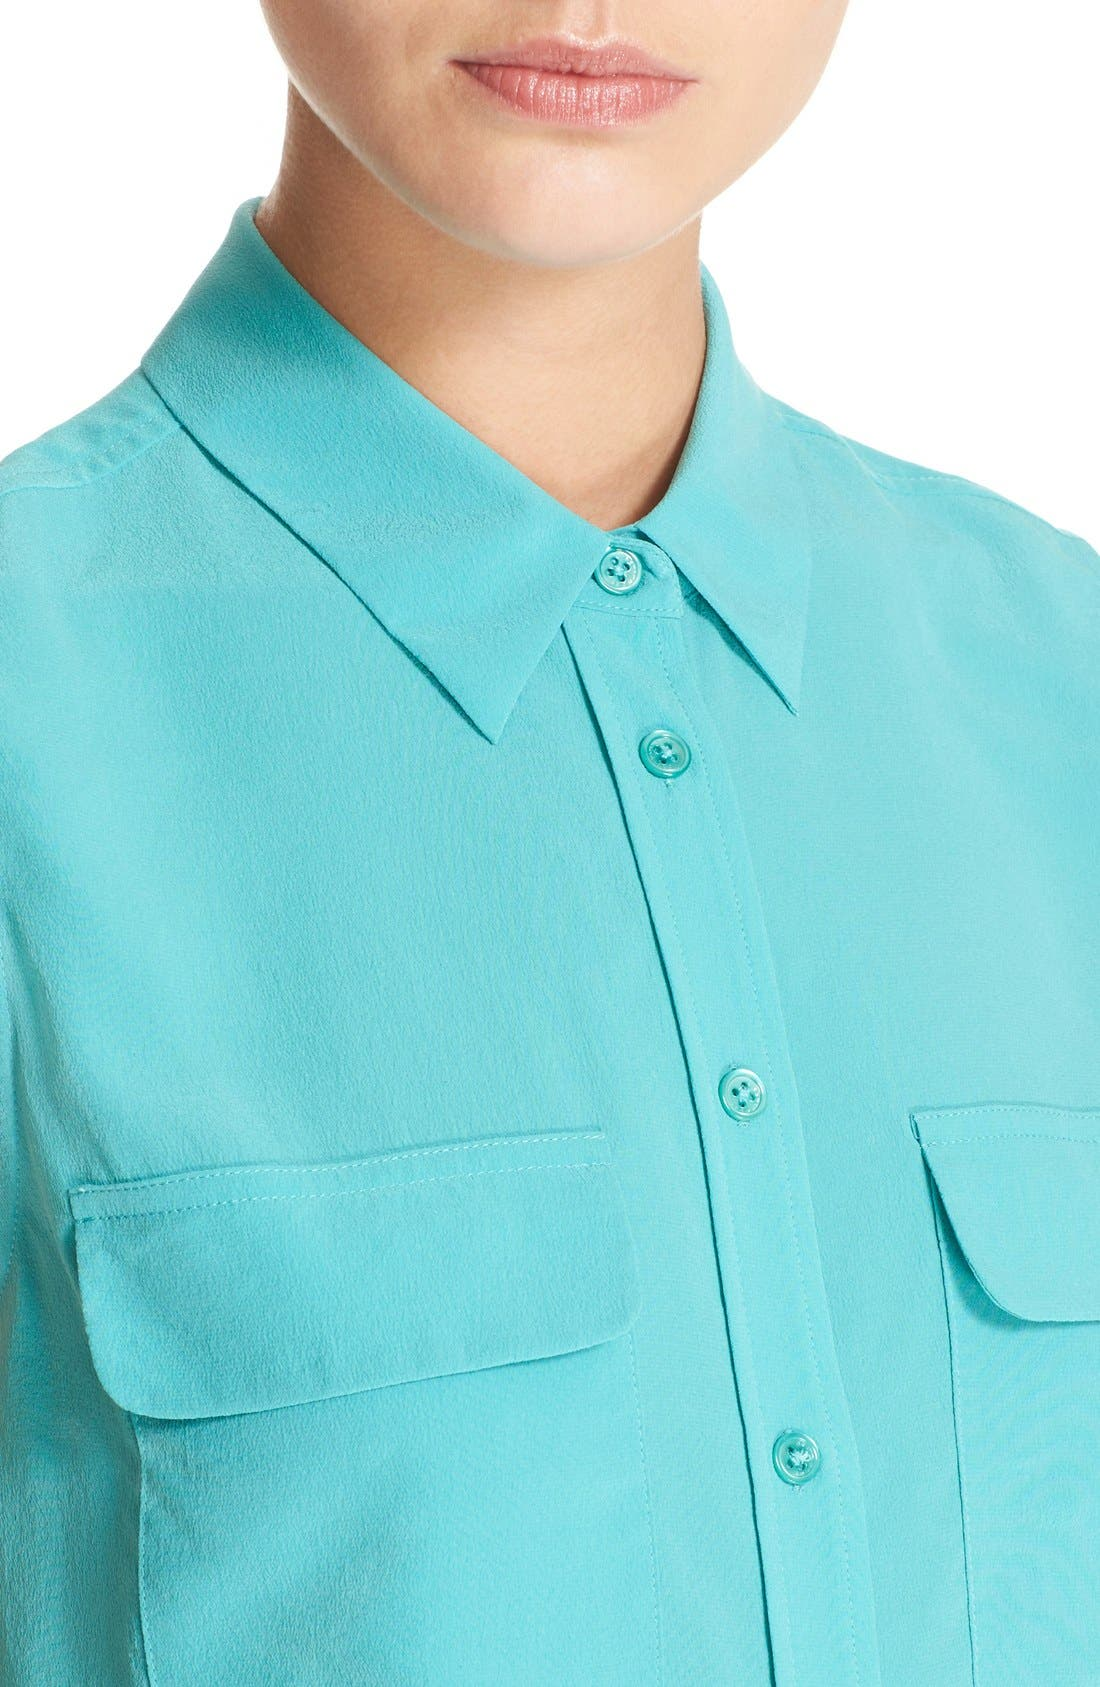 'Slim Signature' Sleeveless Silk Shirt,                             Alternate thumbnail 156, color,